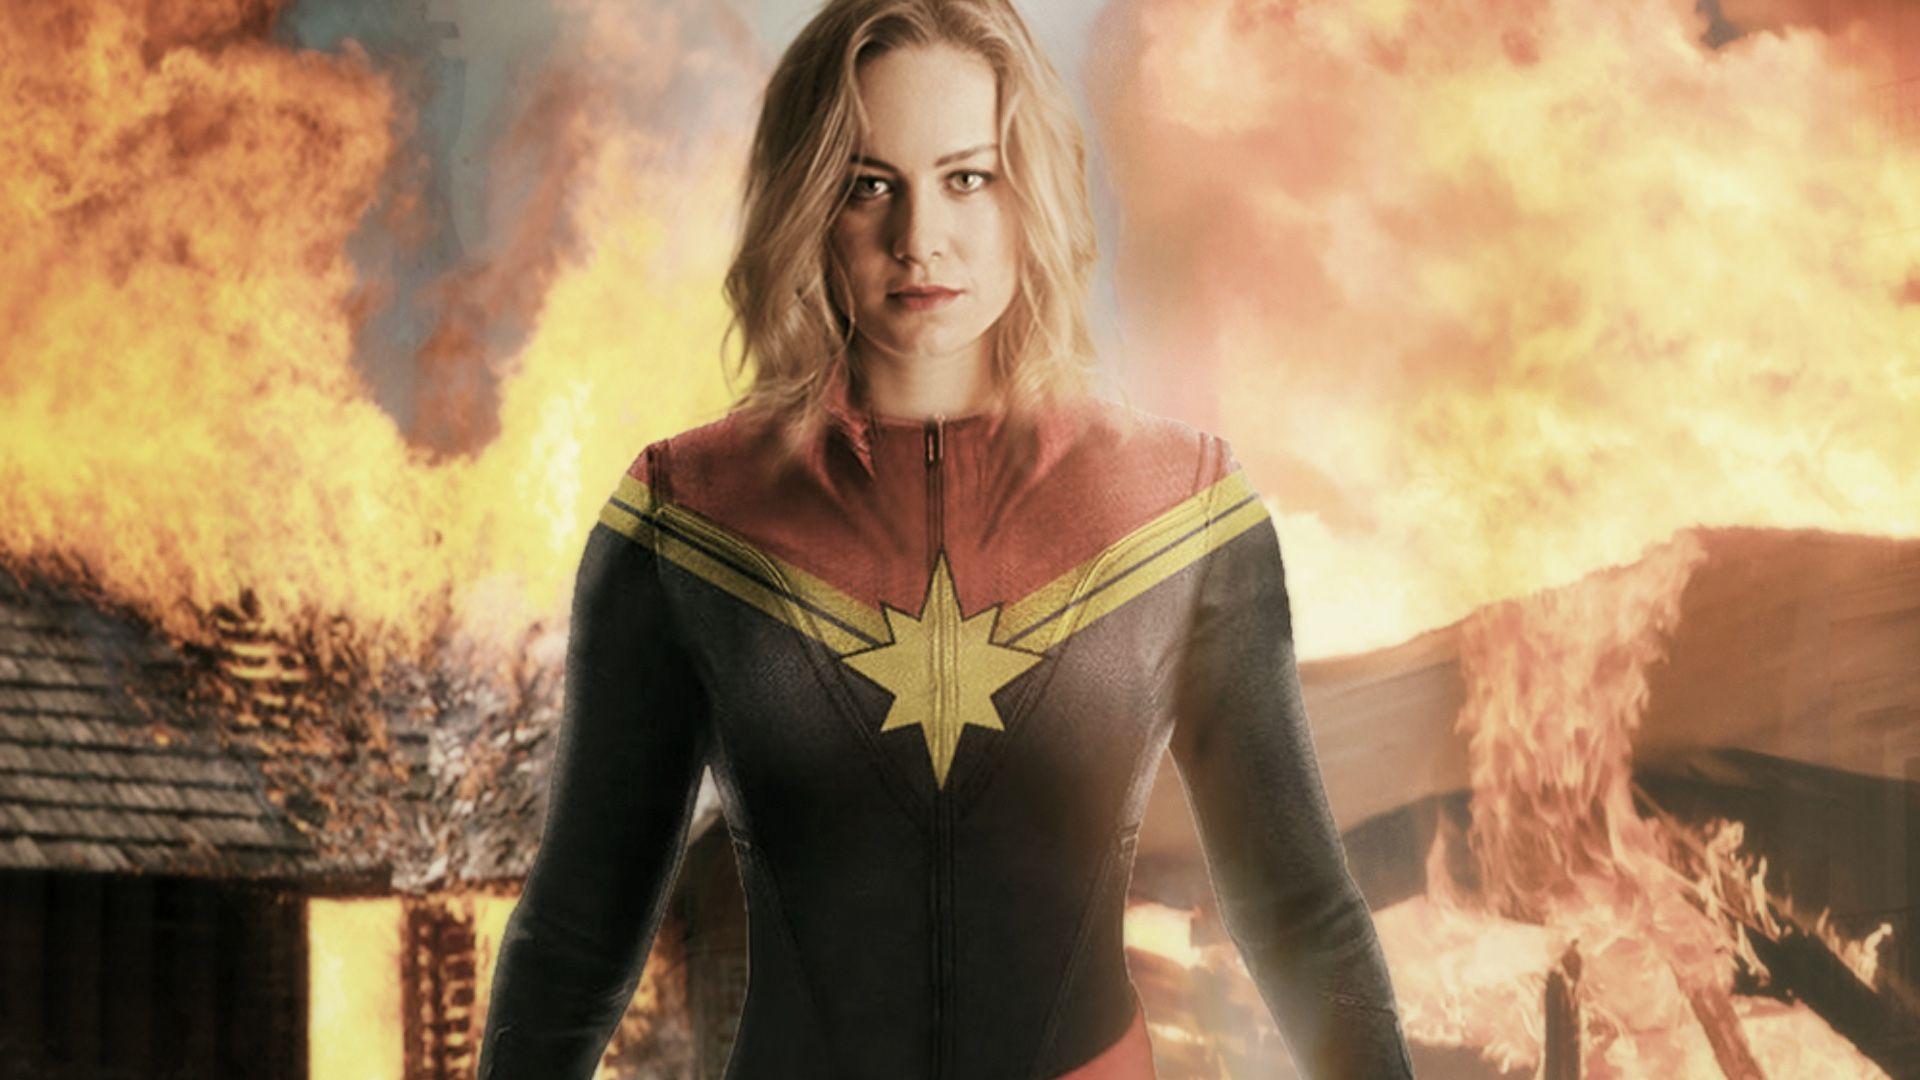 Captain Marvel Brie Larson Wallpapers Wallpaper Cave